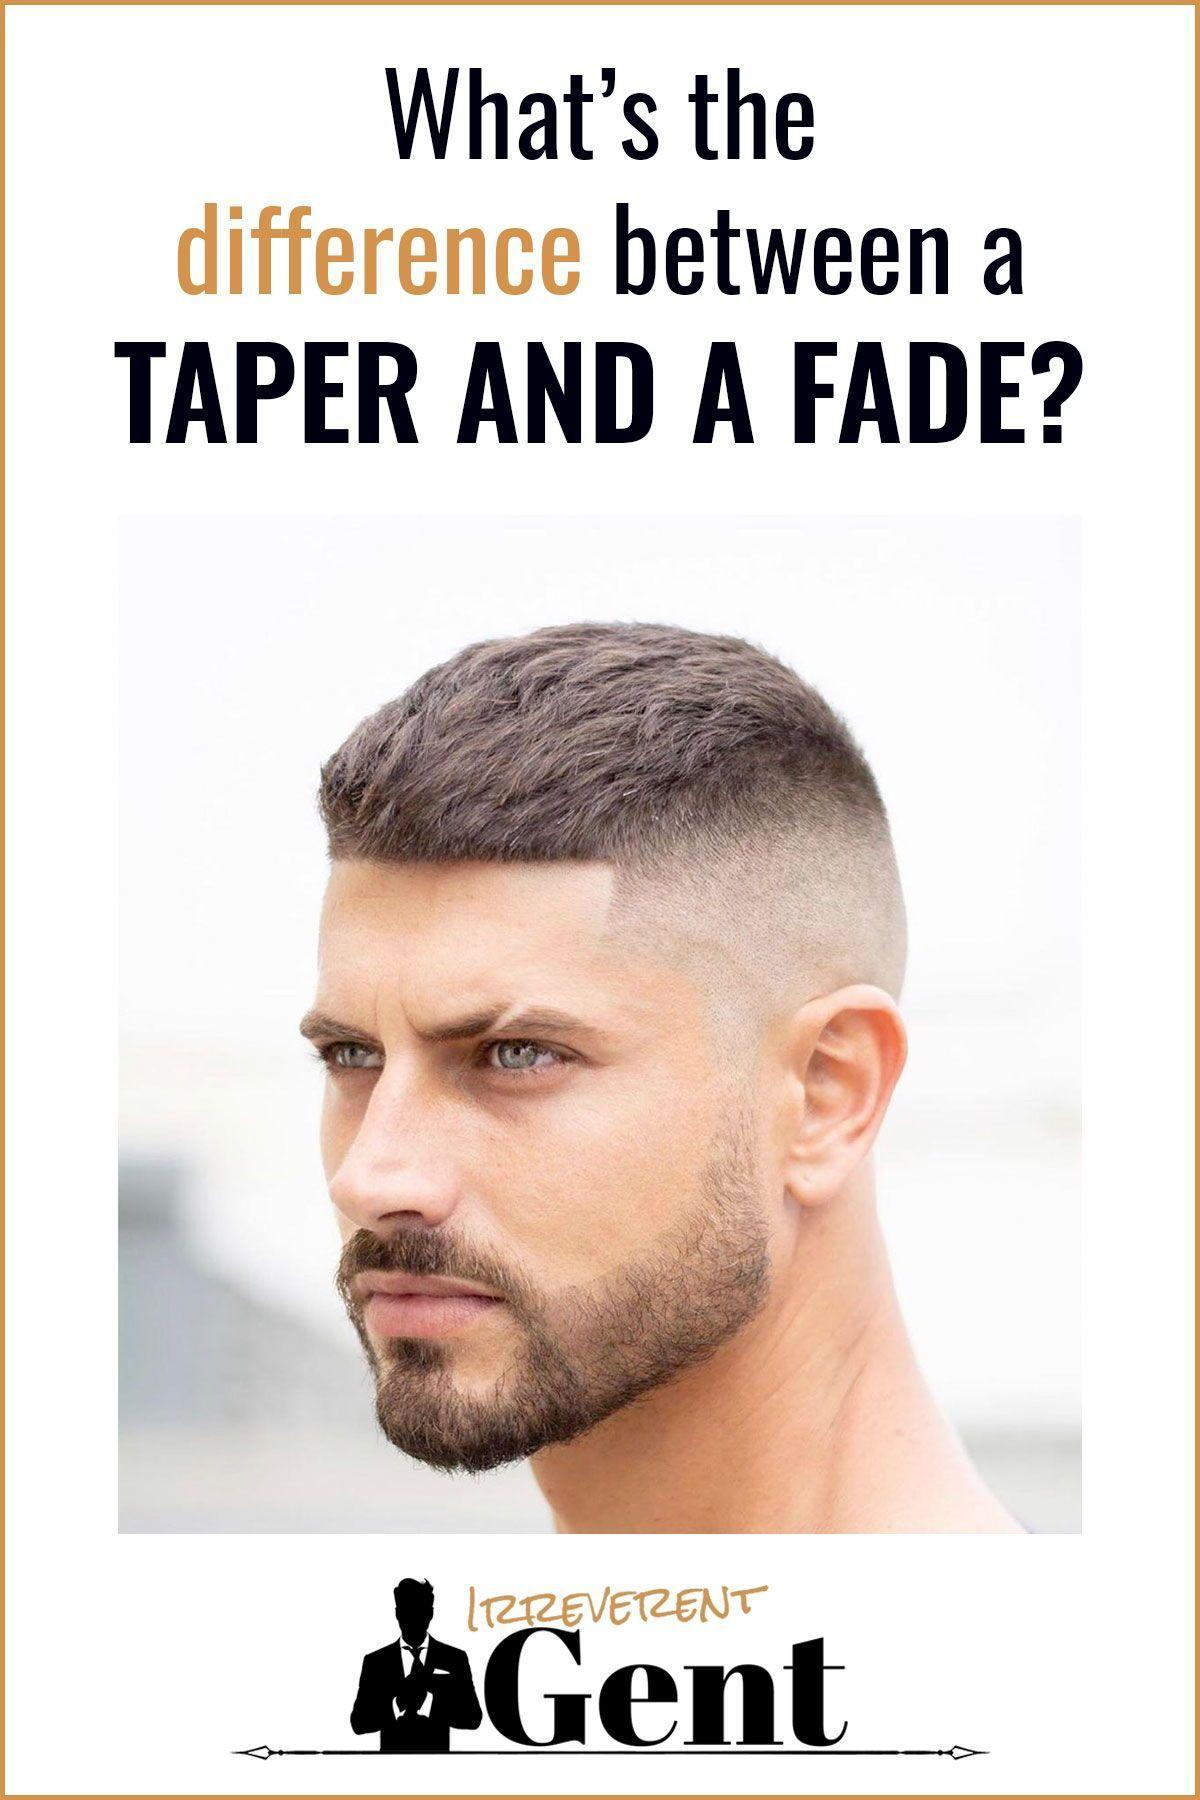 21+ Taper vs fade inspirations